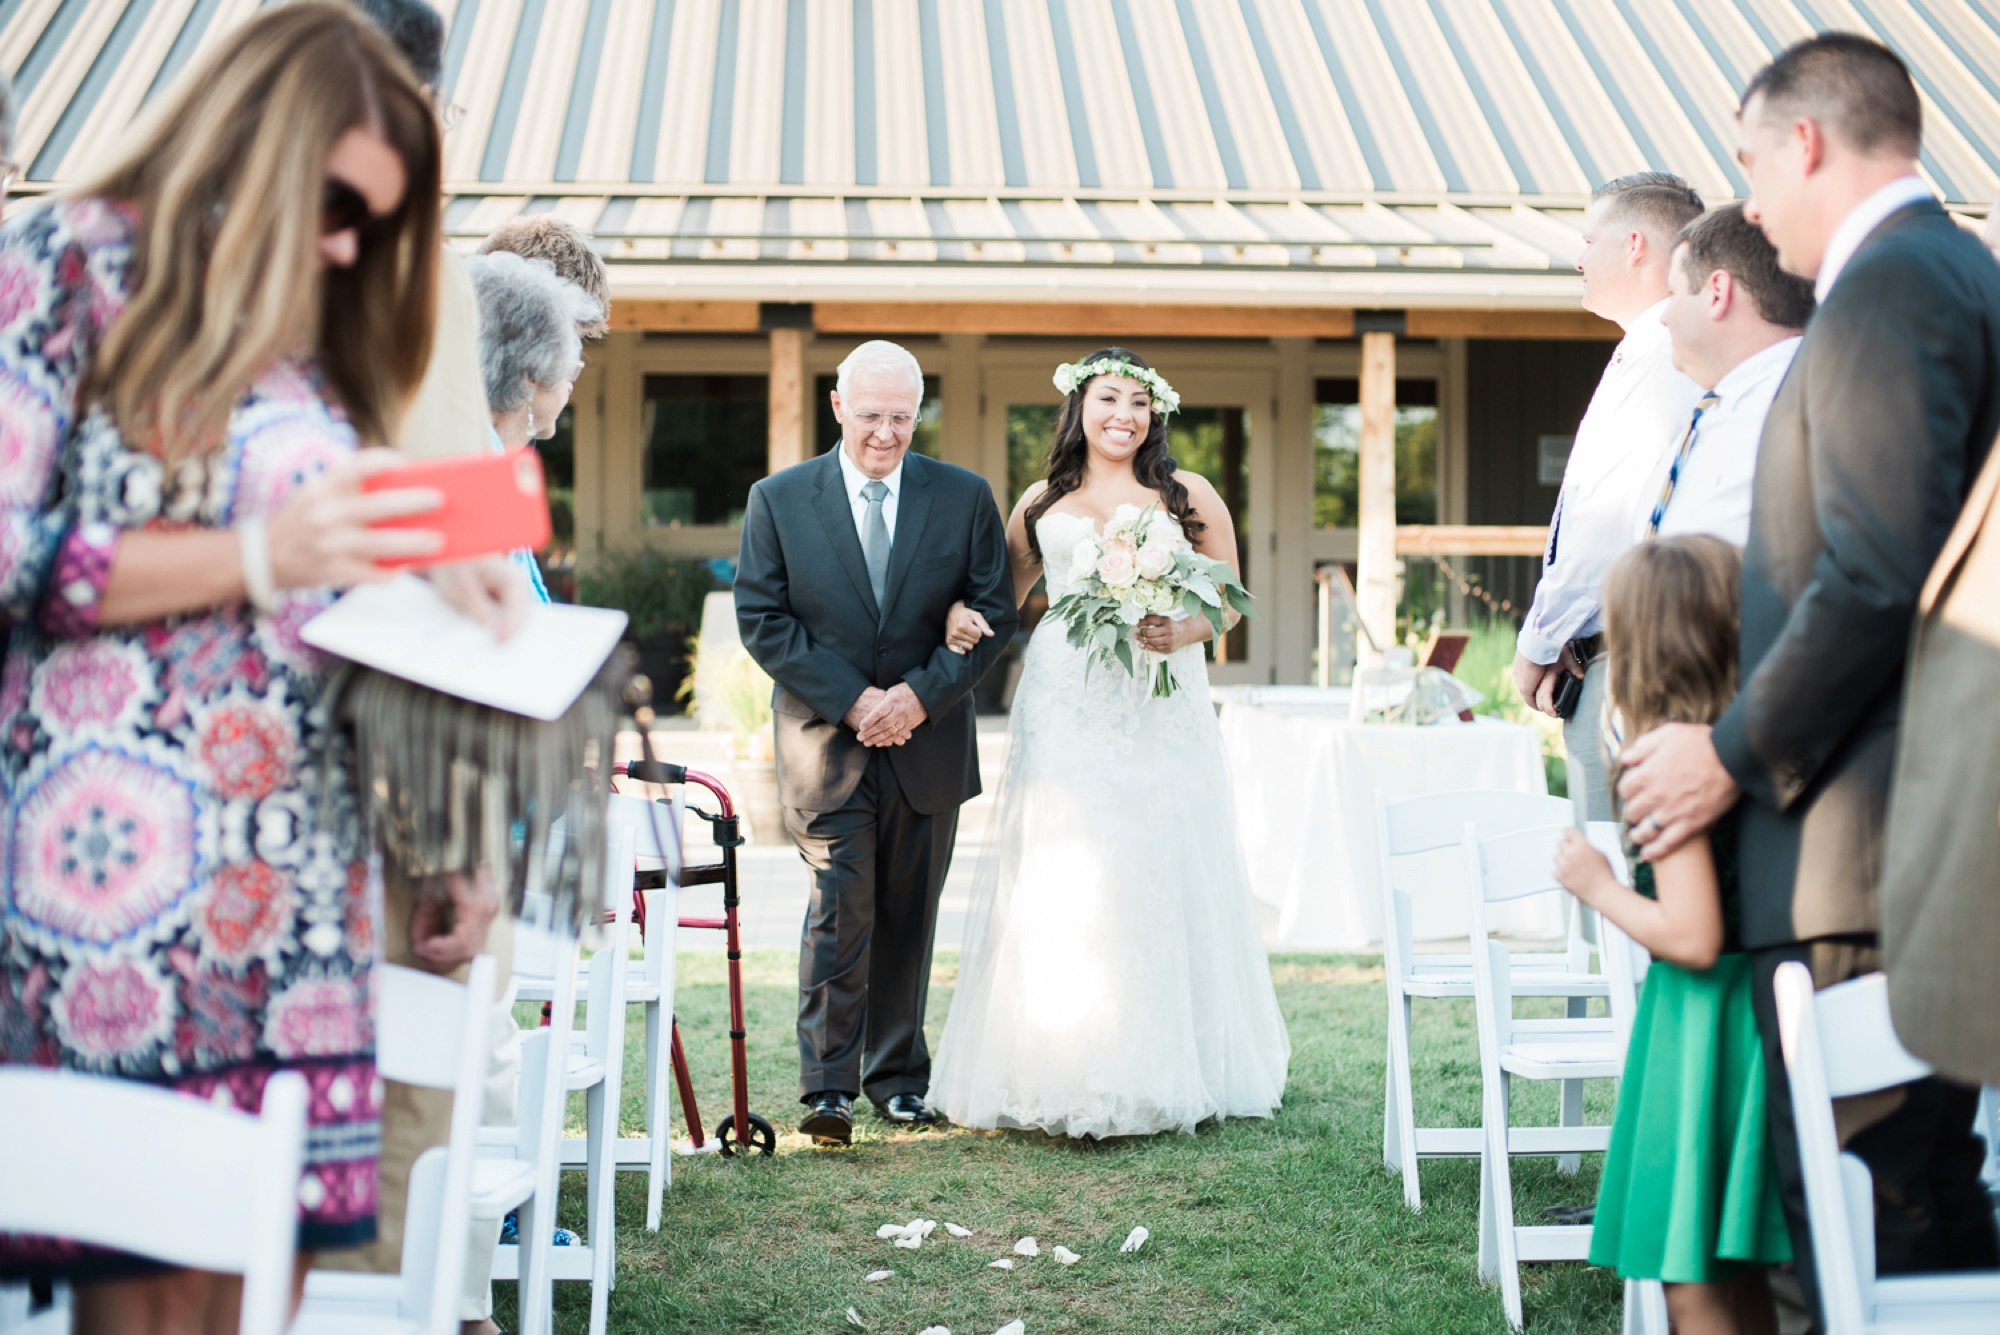 wells-barn-wedding-at-franklin-park-conservatory-82.jpg